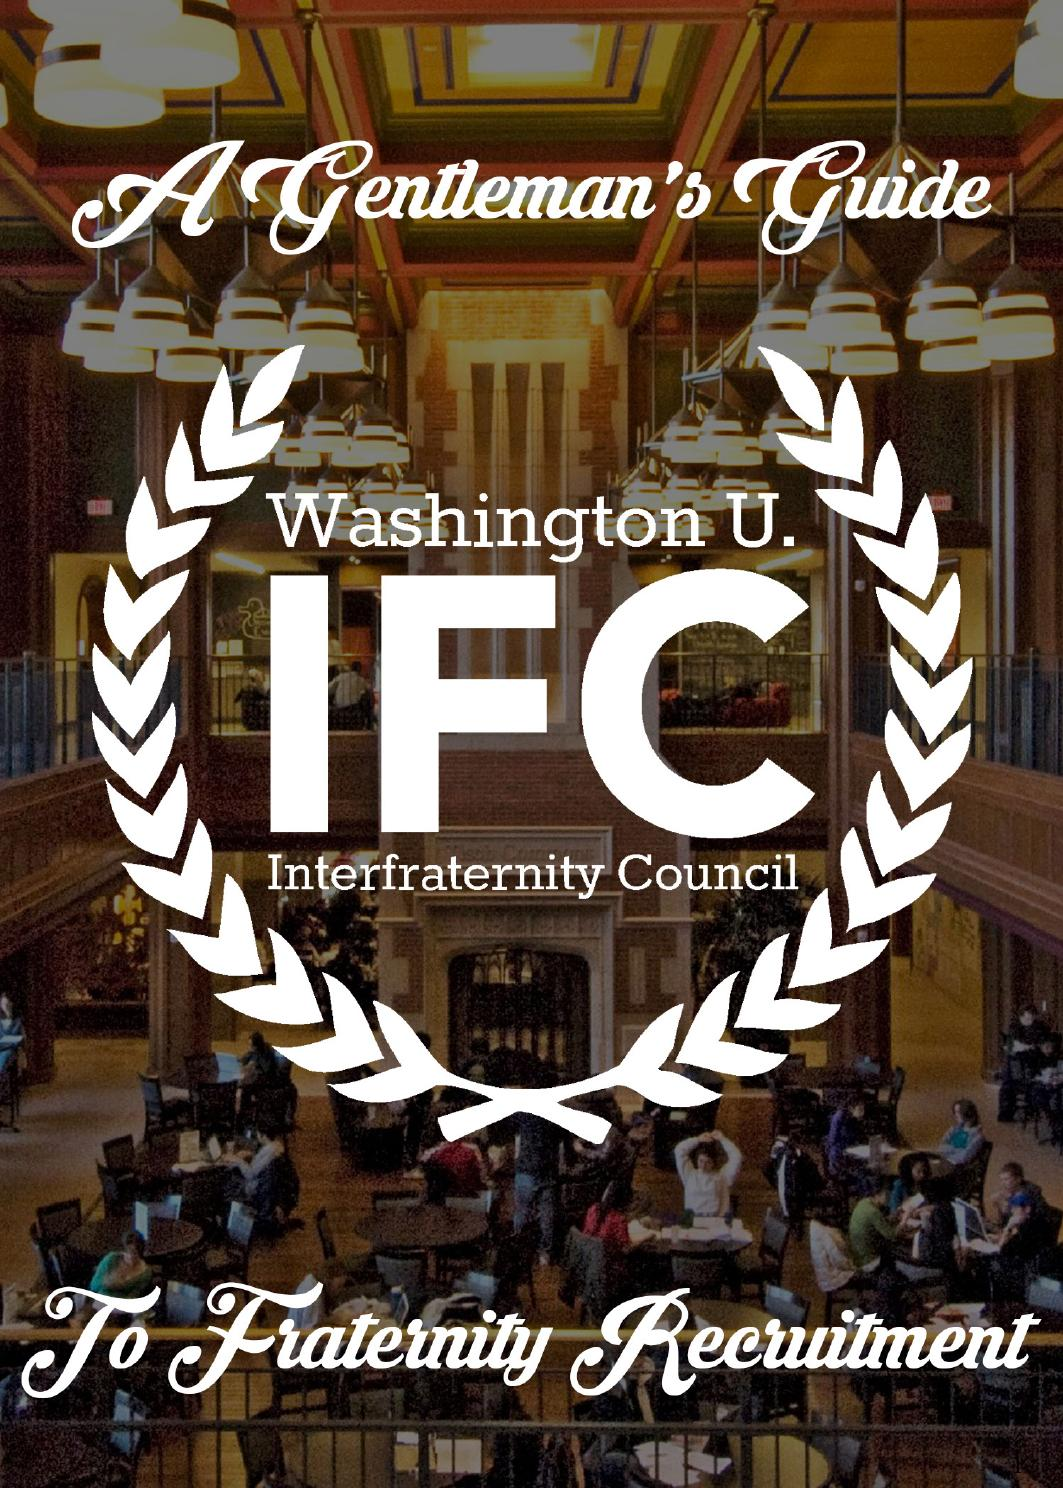 Washington University Ifc Formal Recruitment Guide By Washington University Interfraternity